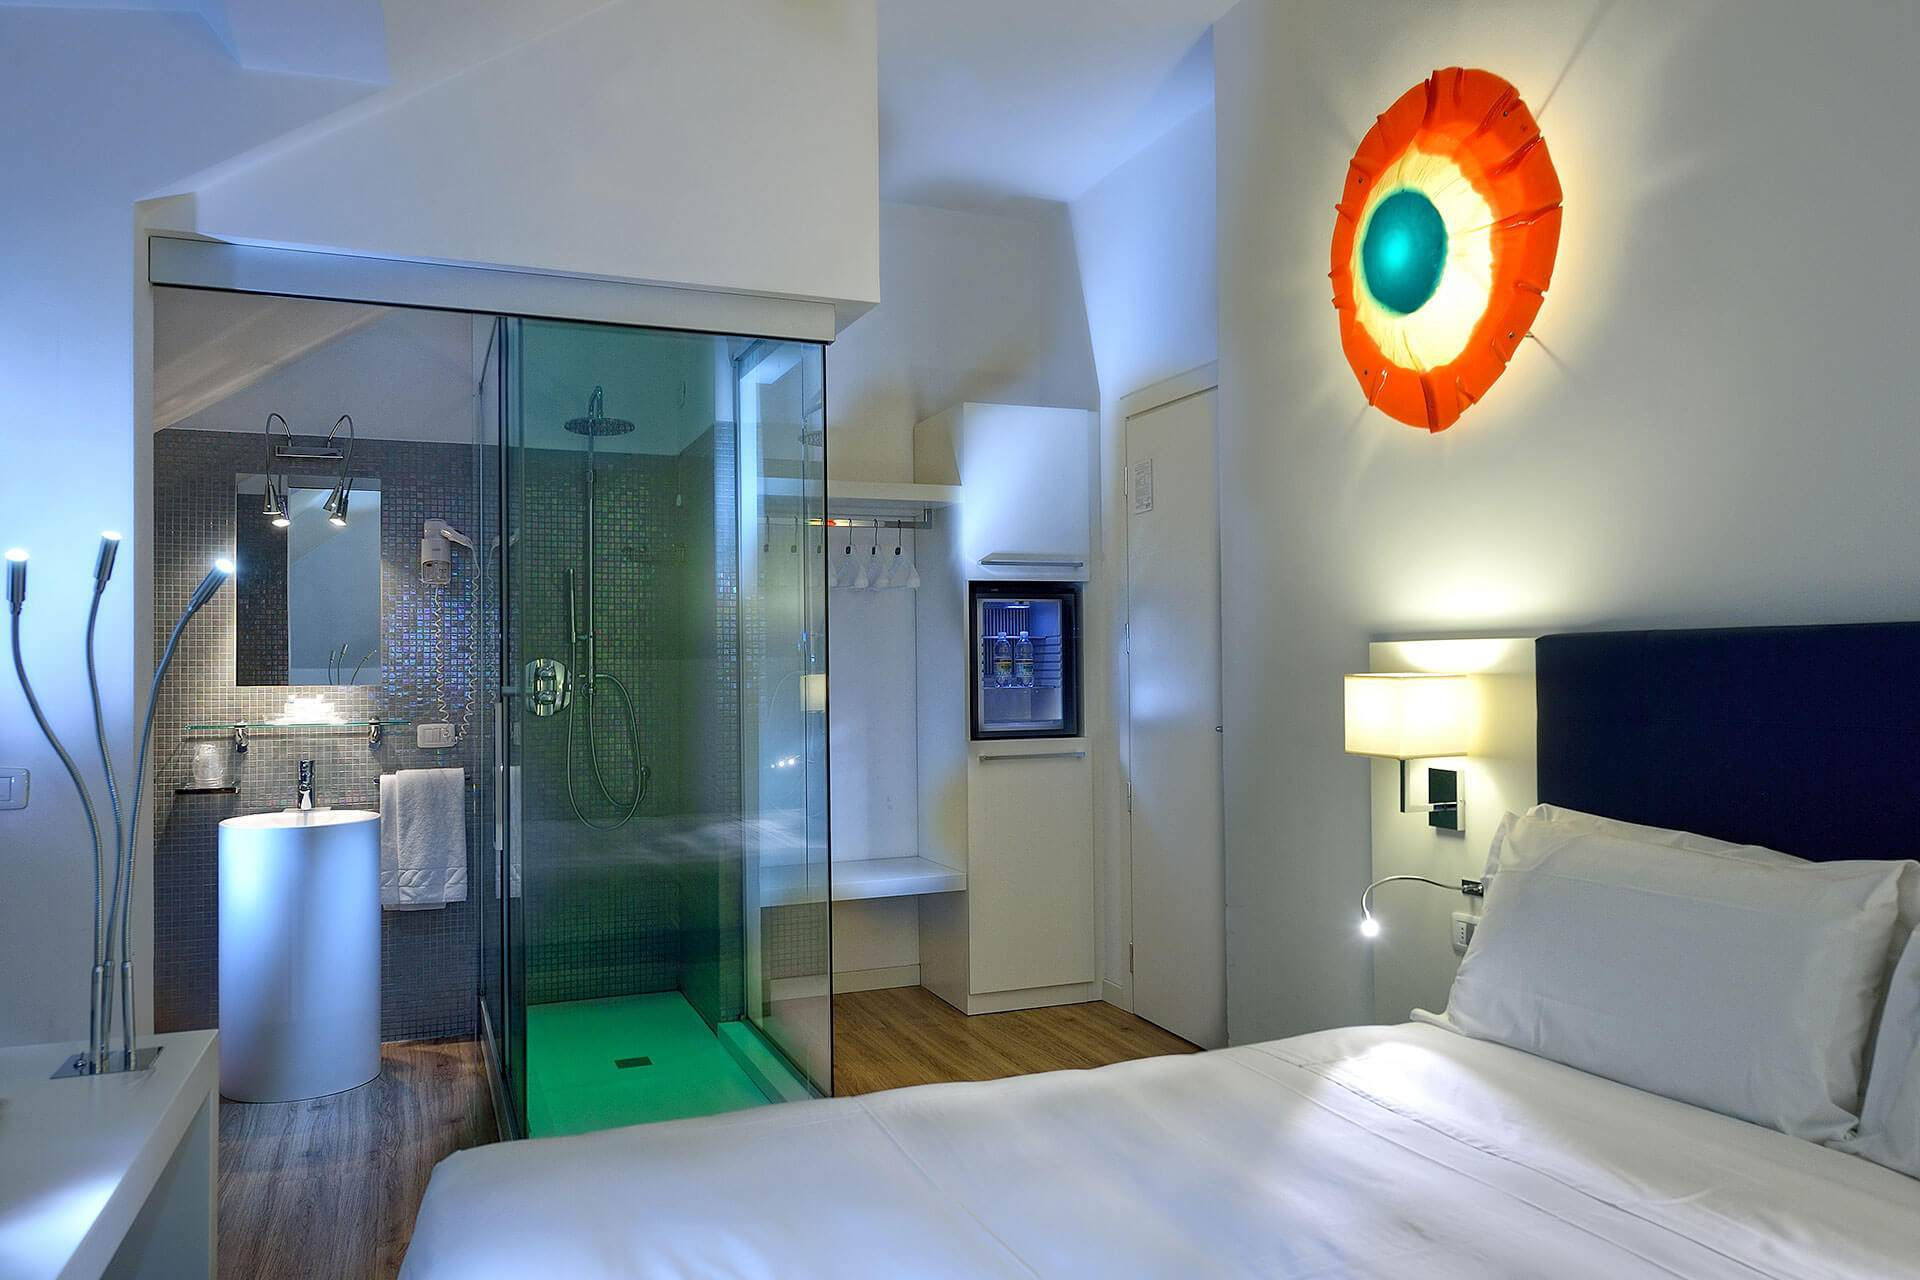 Elite hotel mestre venice official site 4 star hotel for Design boutique hotel venice